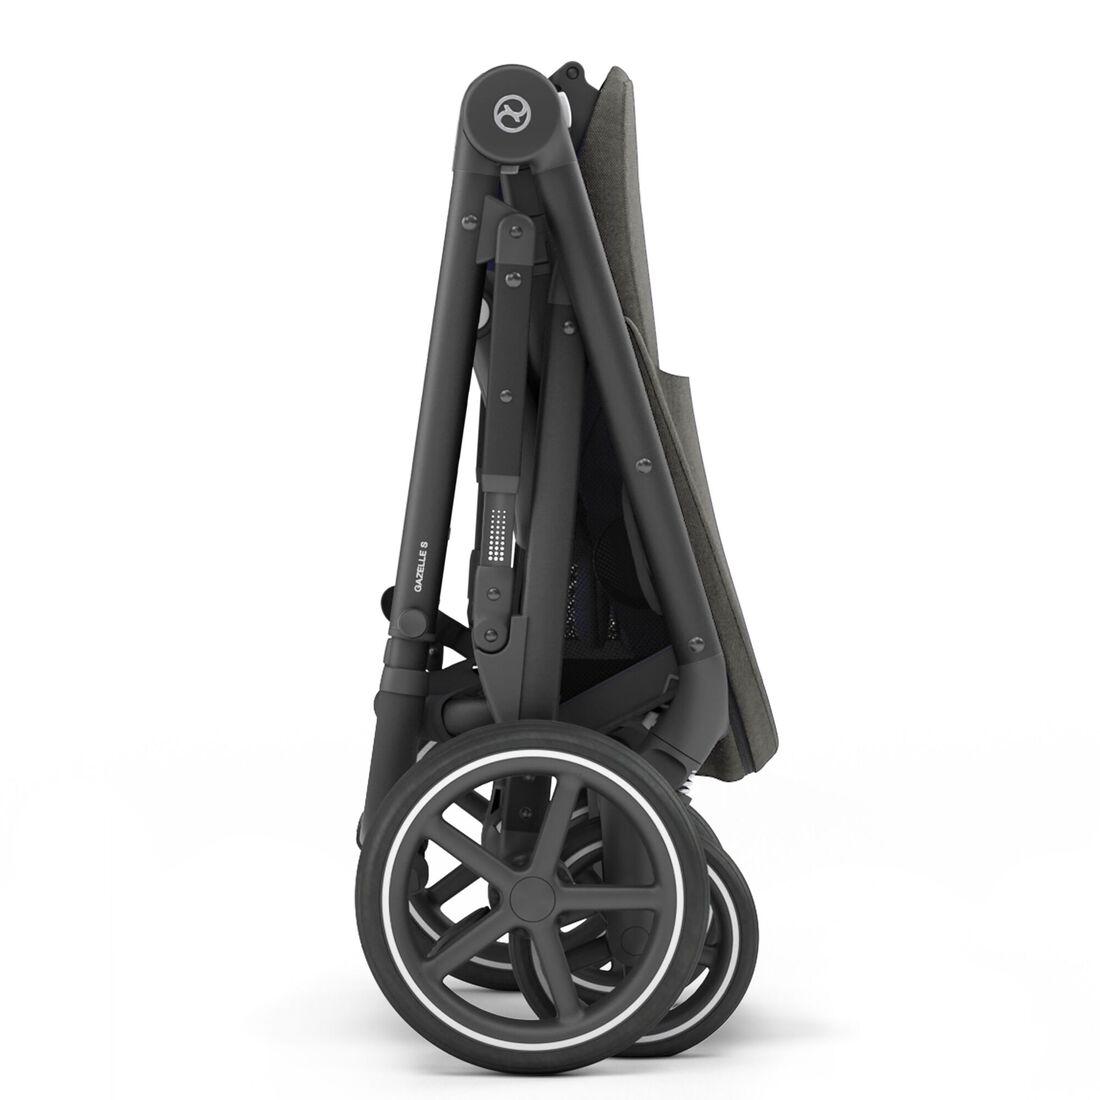 CYBEX Gazelle S - Soho Grey (Schwarzer Rahmen) in Soho Grey (Black Frame) large Bild 9